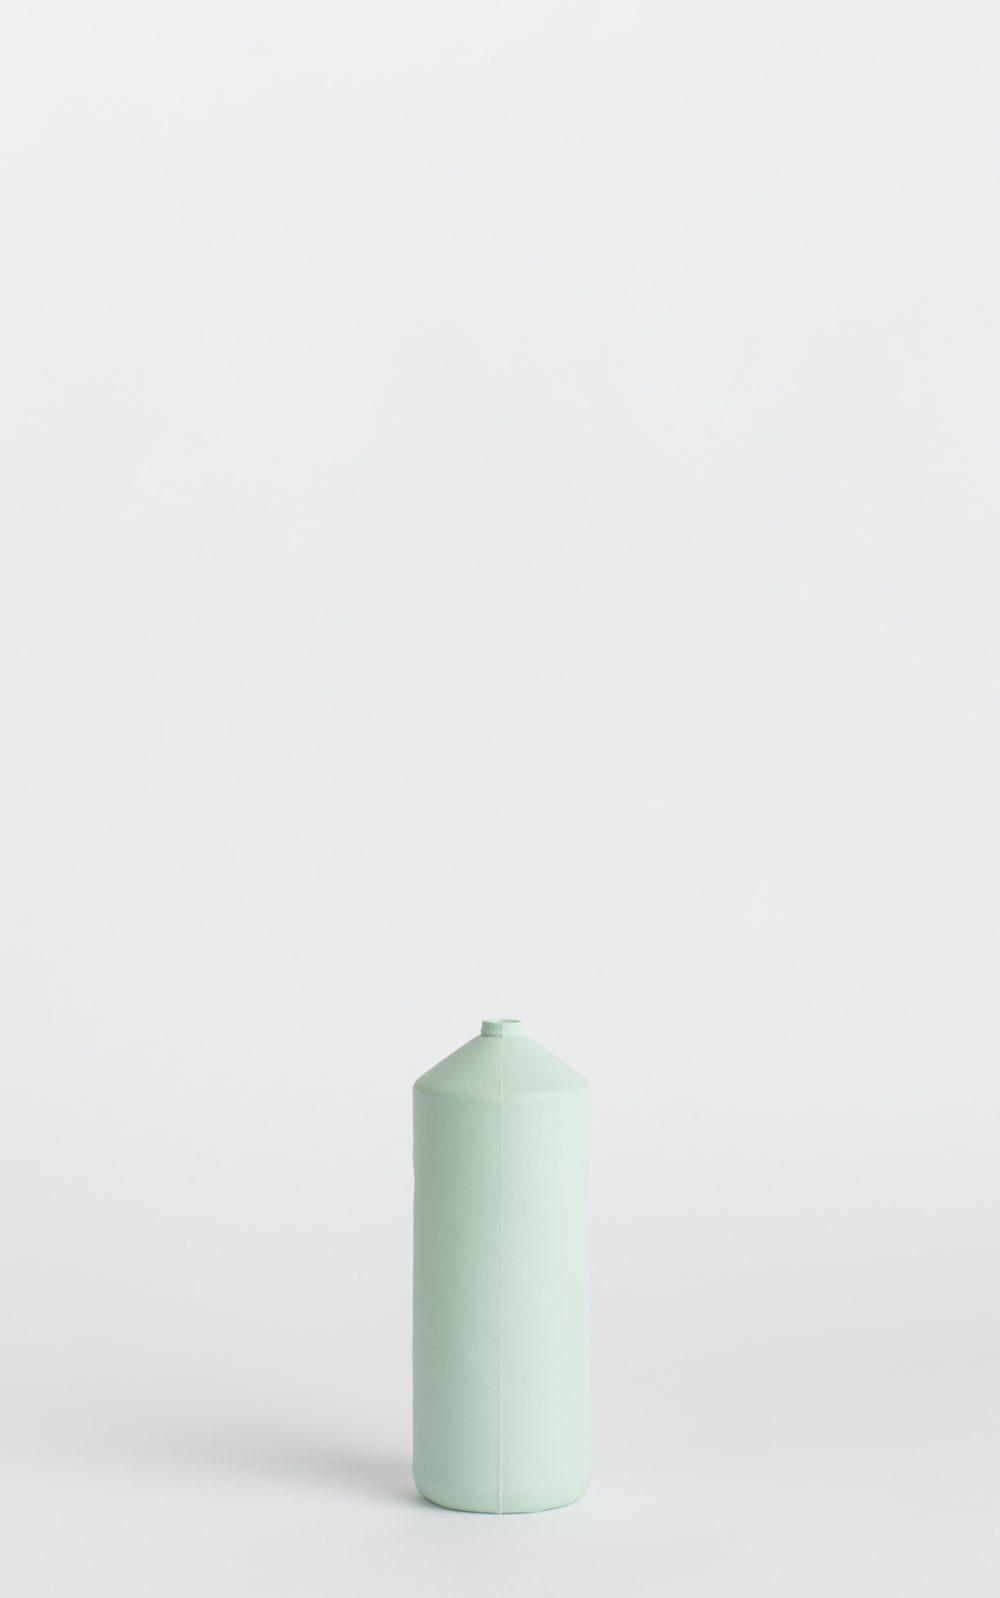 bottle vase #2 mint